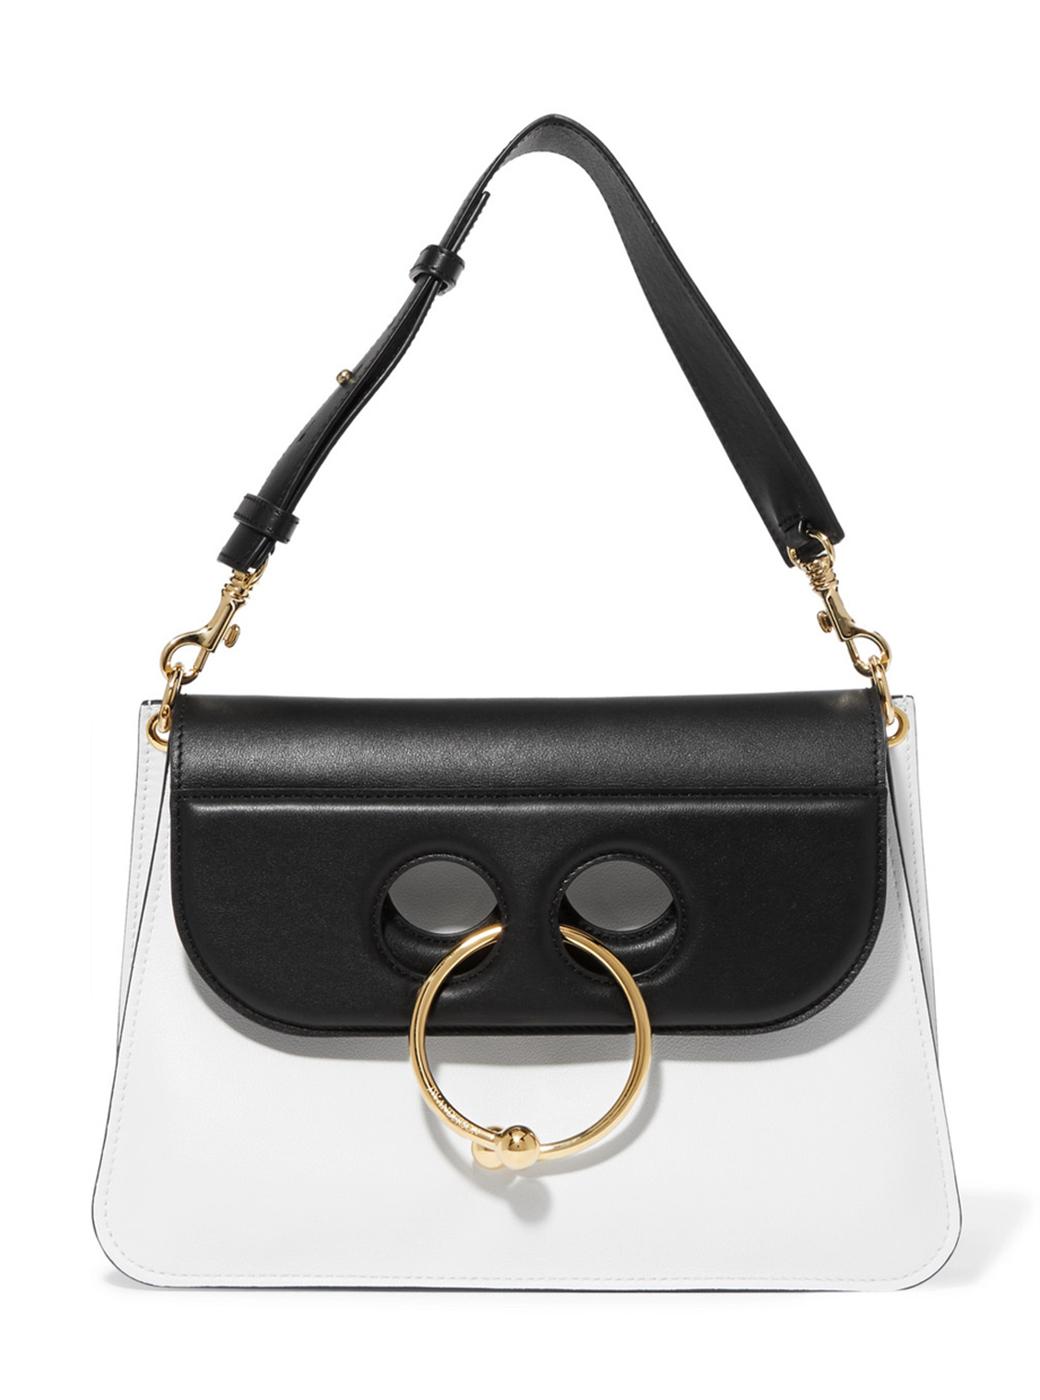 jw anderson pierce bag black and white